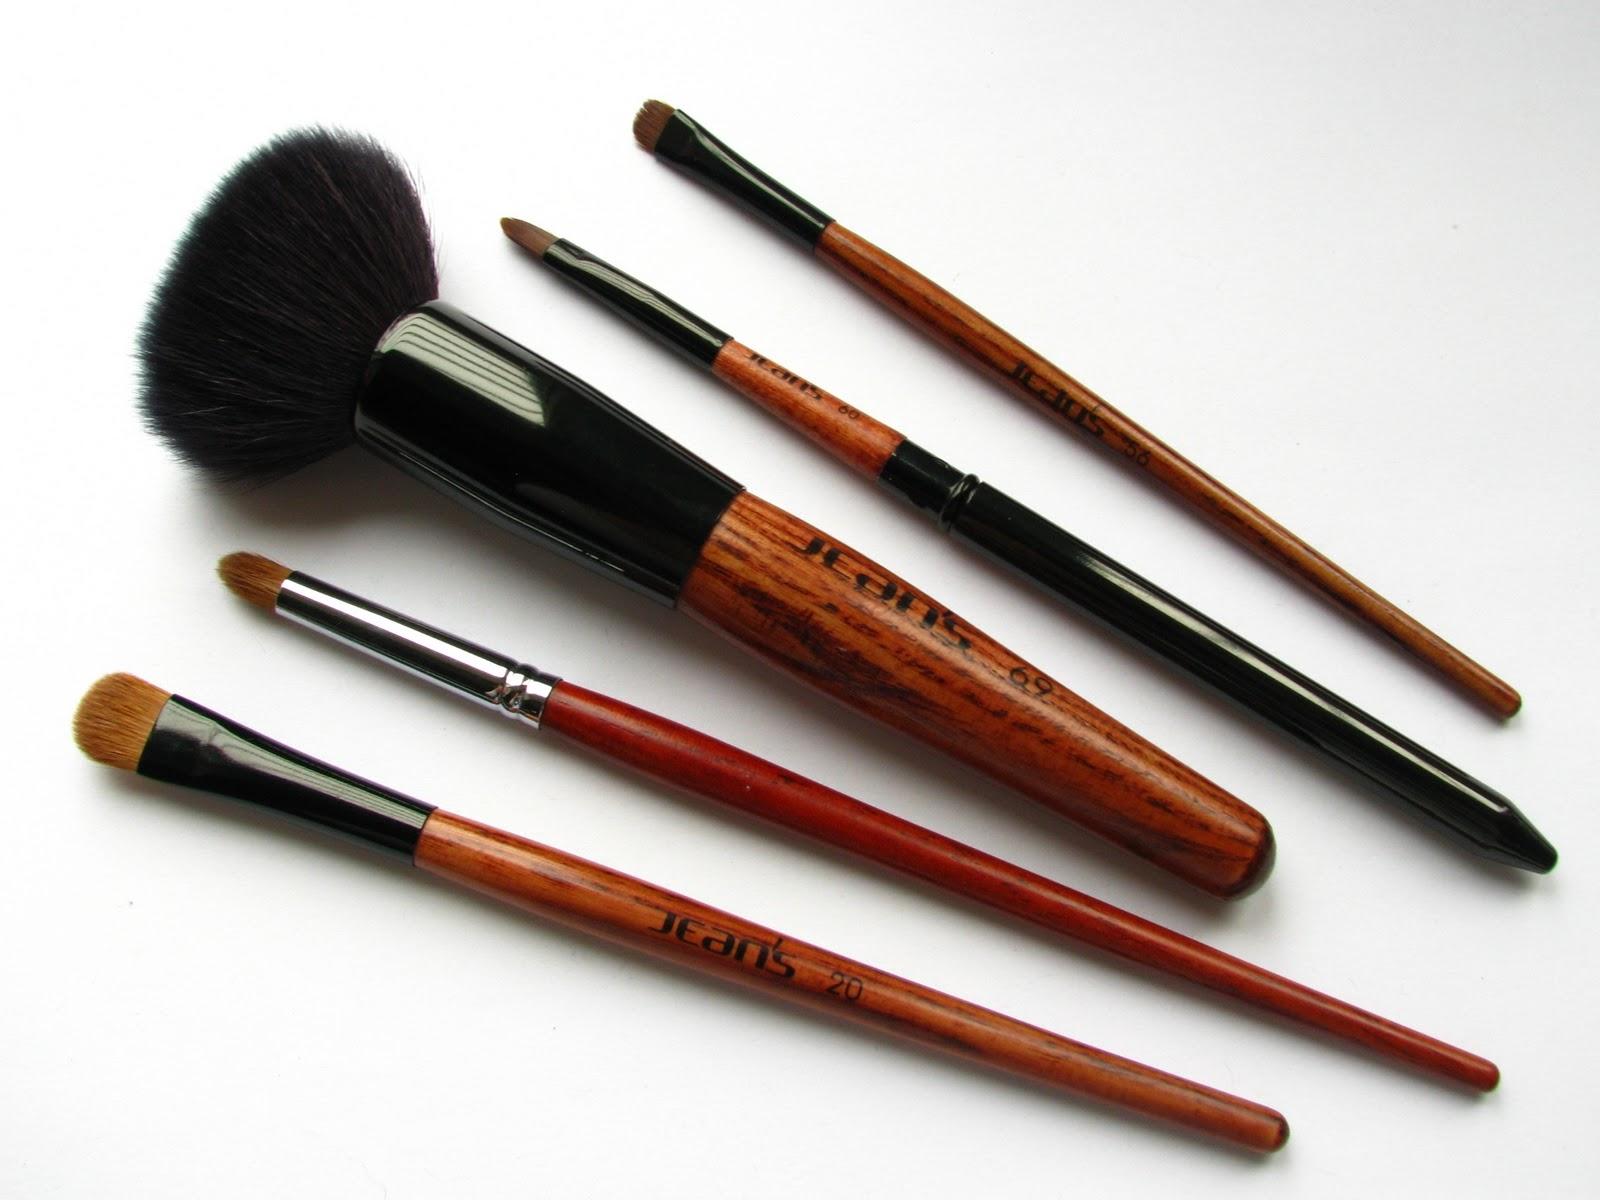 Кисти для макияжа под заказ